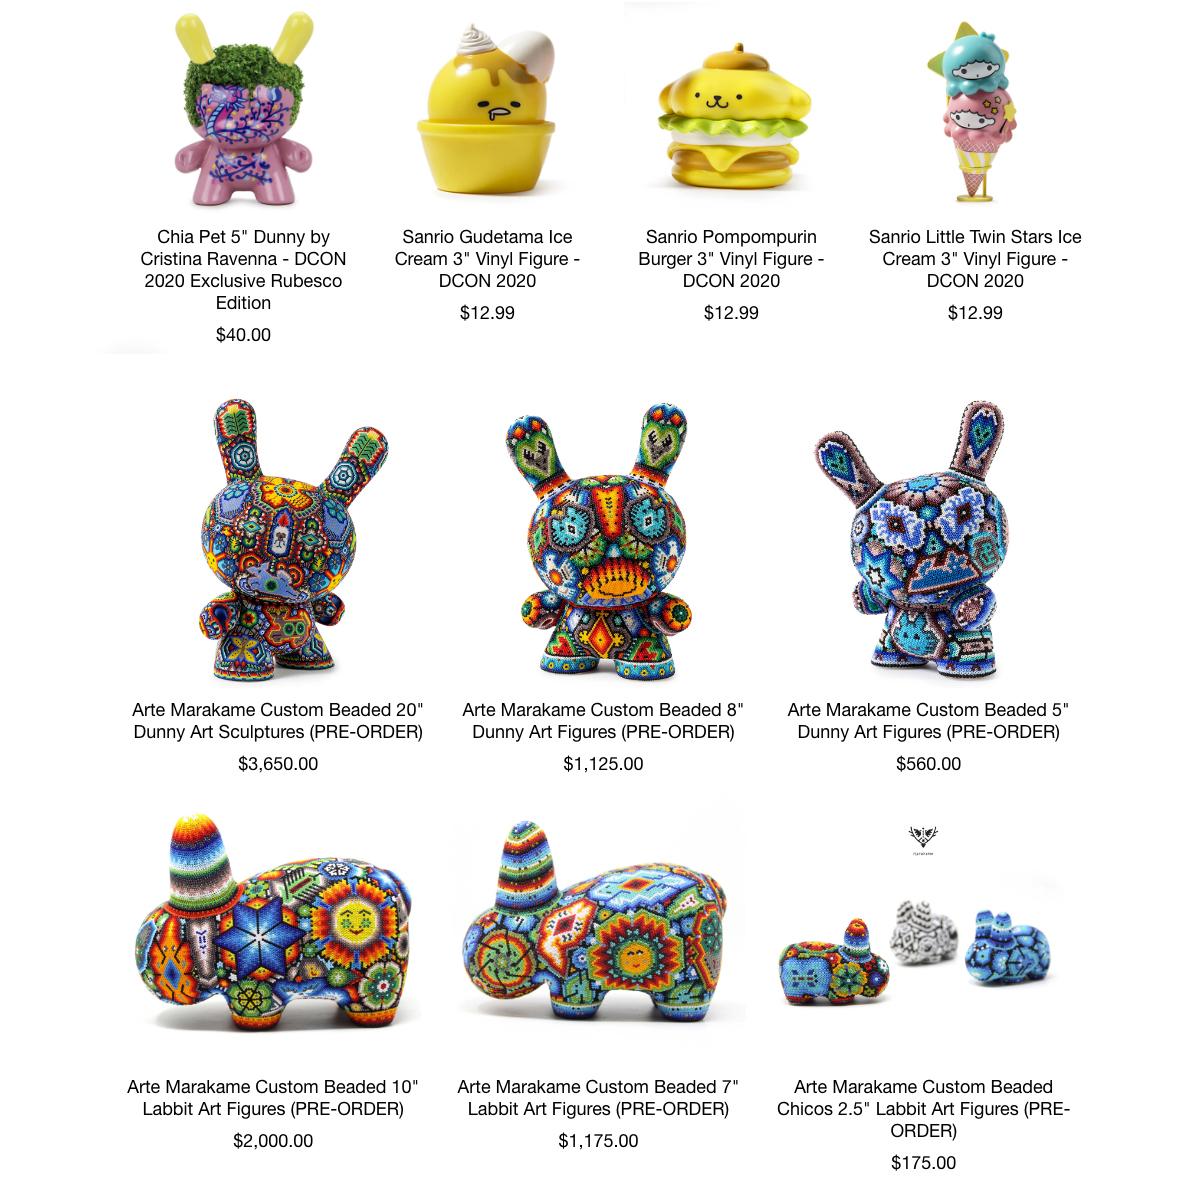 DCON20: Kidrobot Releases